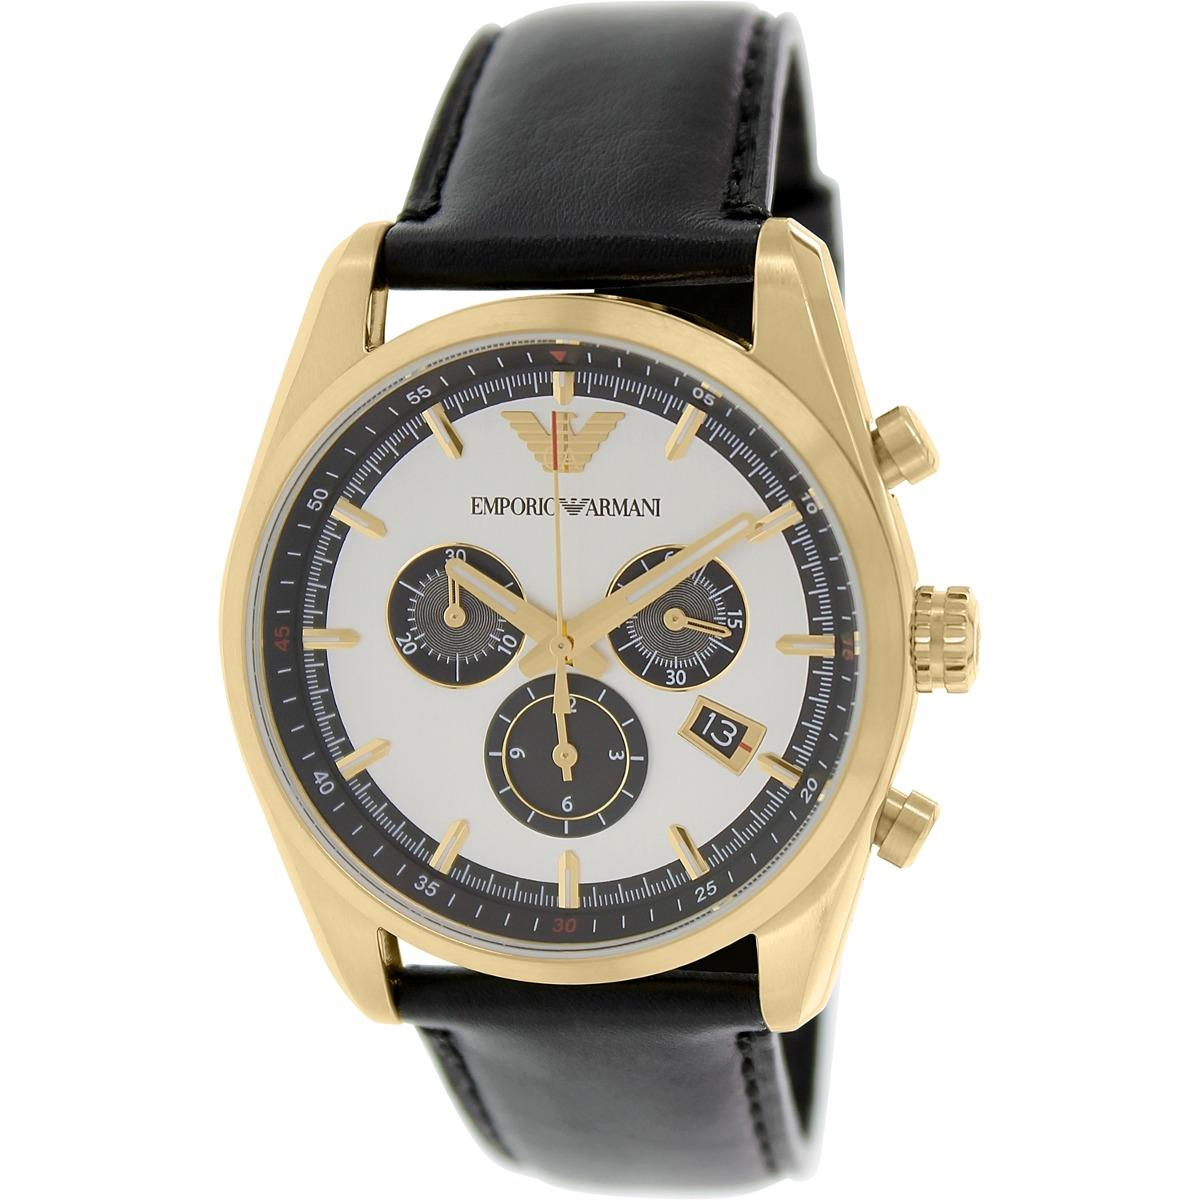 b8473a3b6308 Reloj Emporio Armani Para Hombre Ar6006 Deportivo Con -   1.387.550 ...